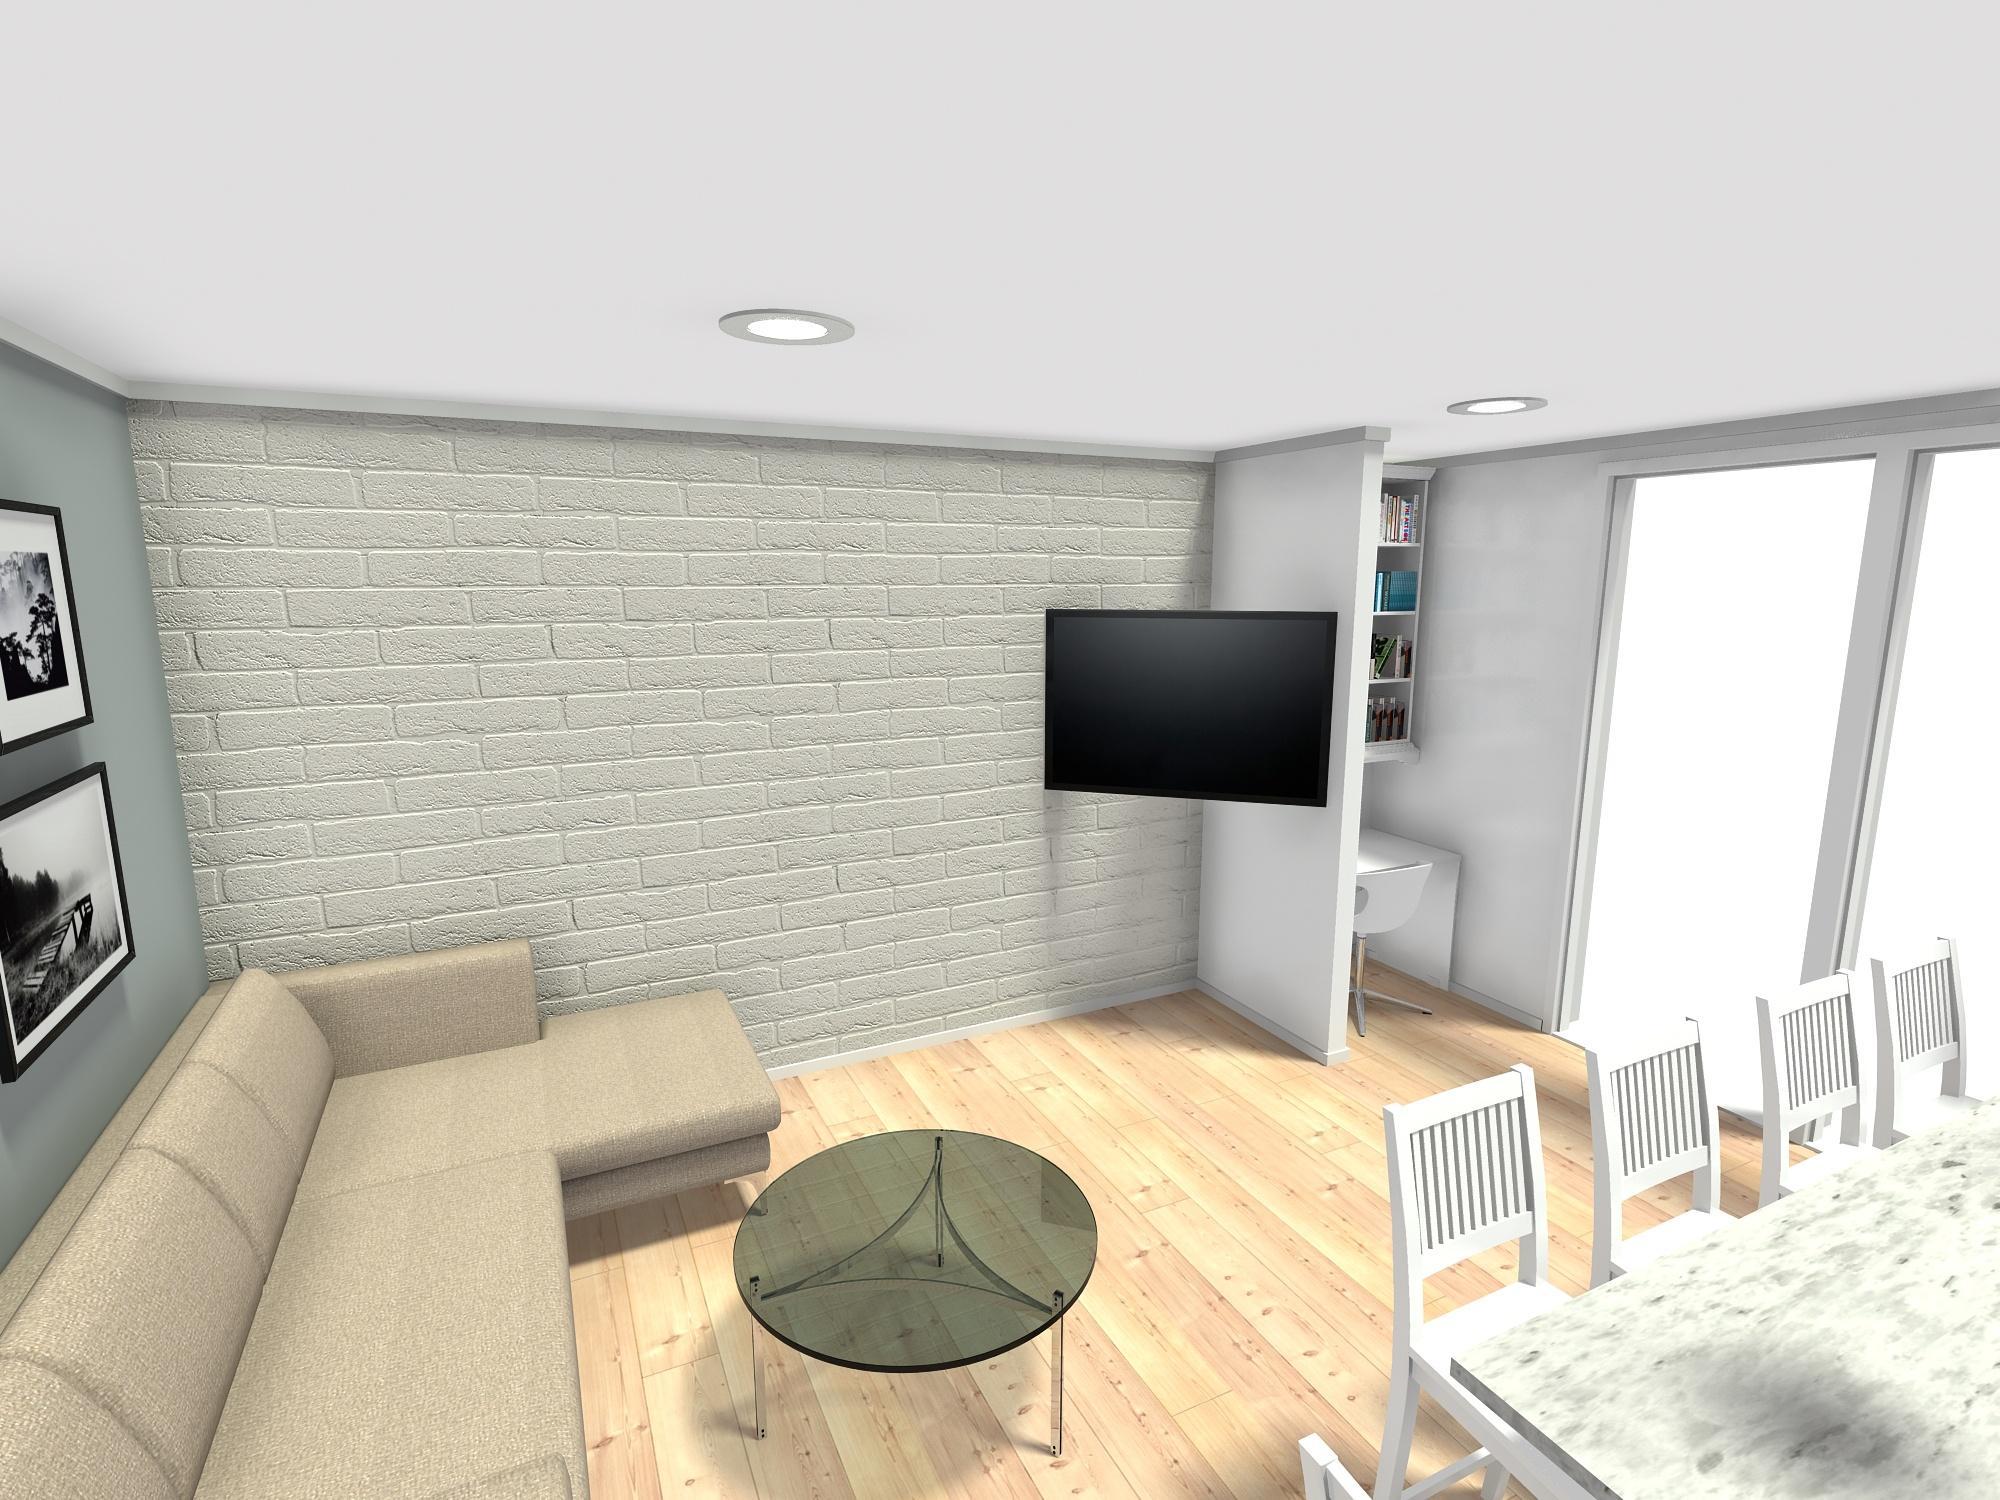 trosoban stan 60 m2 dnevni boravak kuhinjski otok